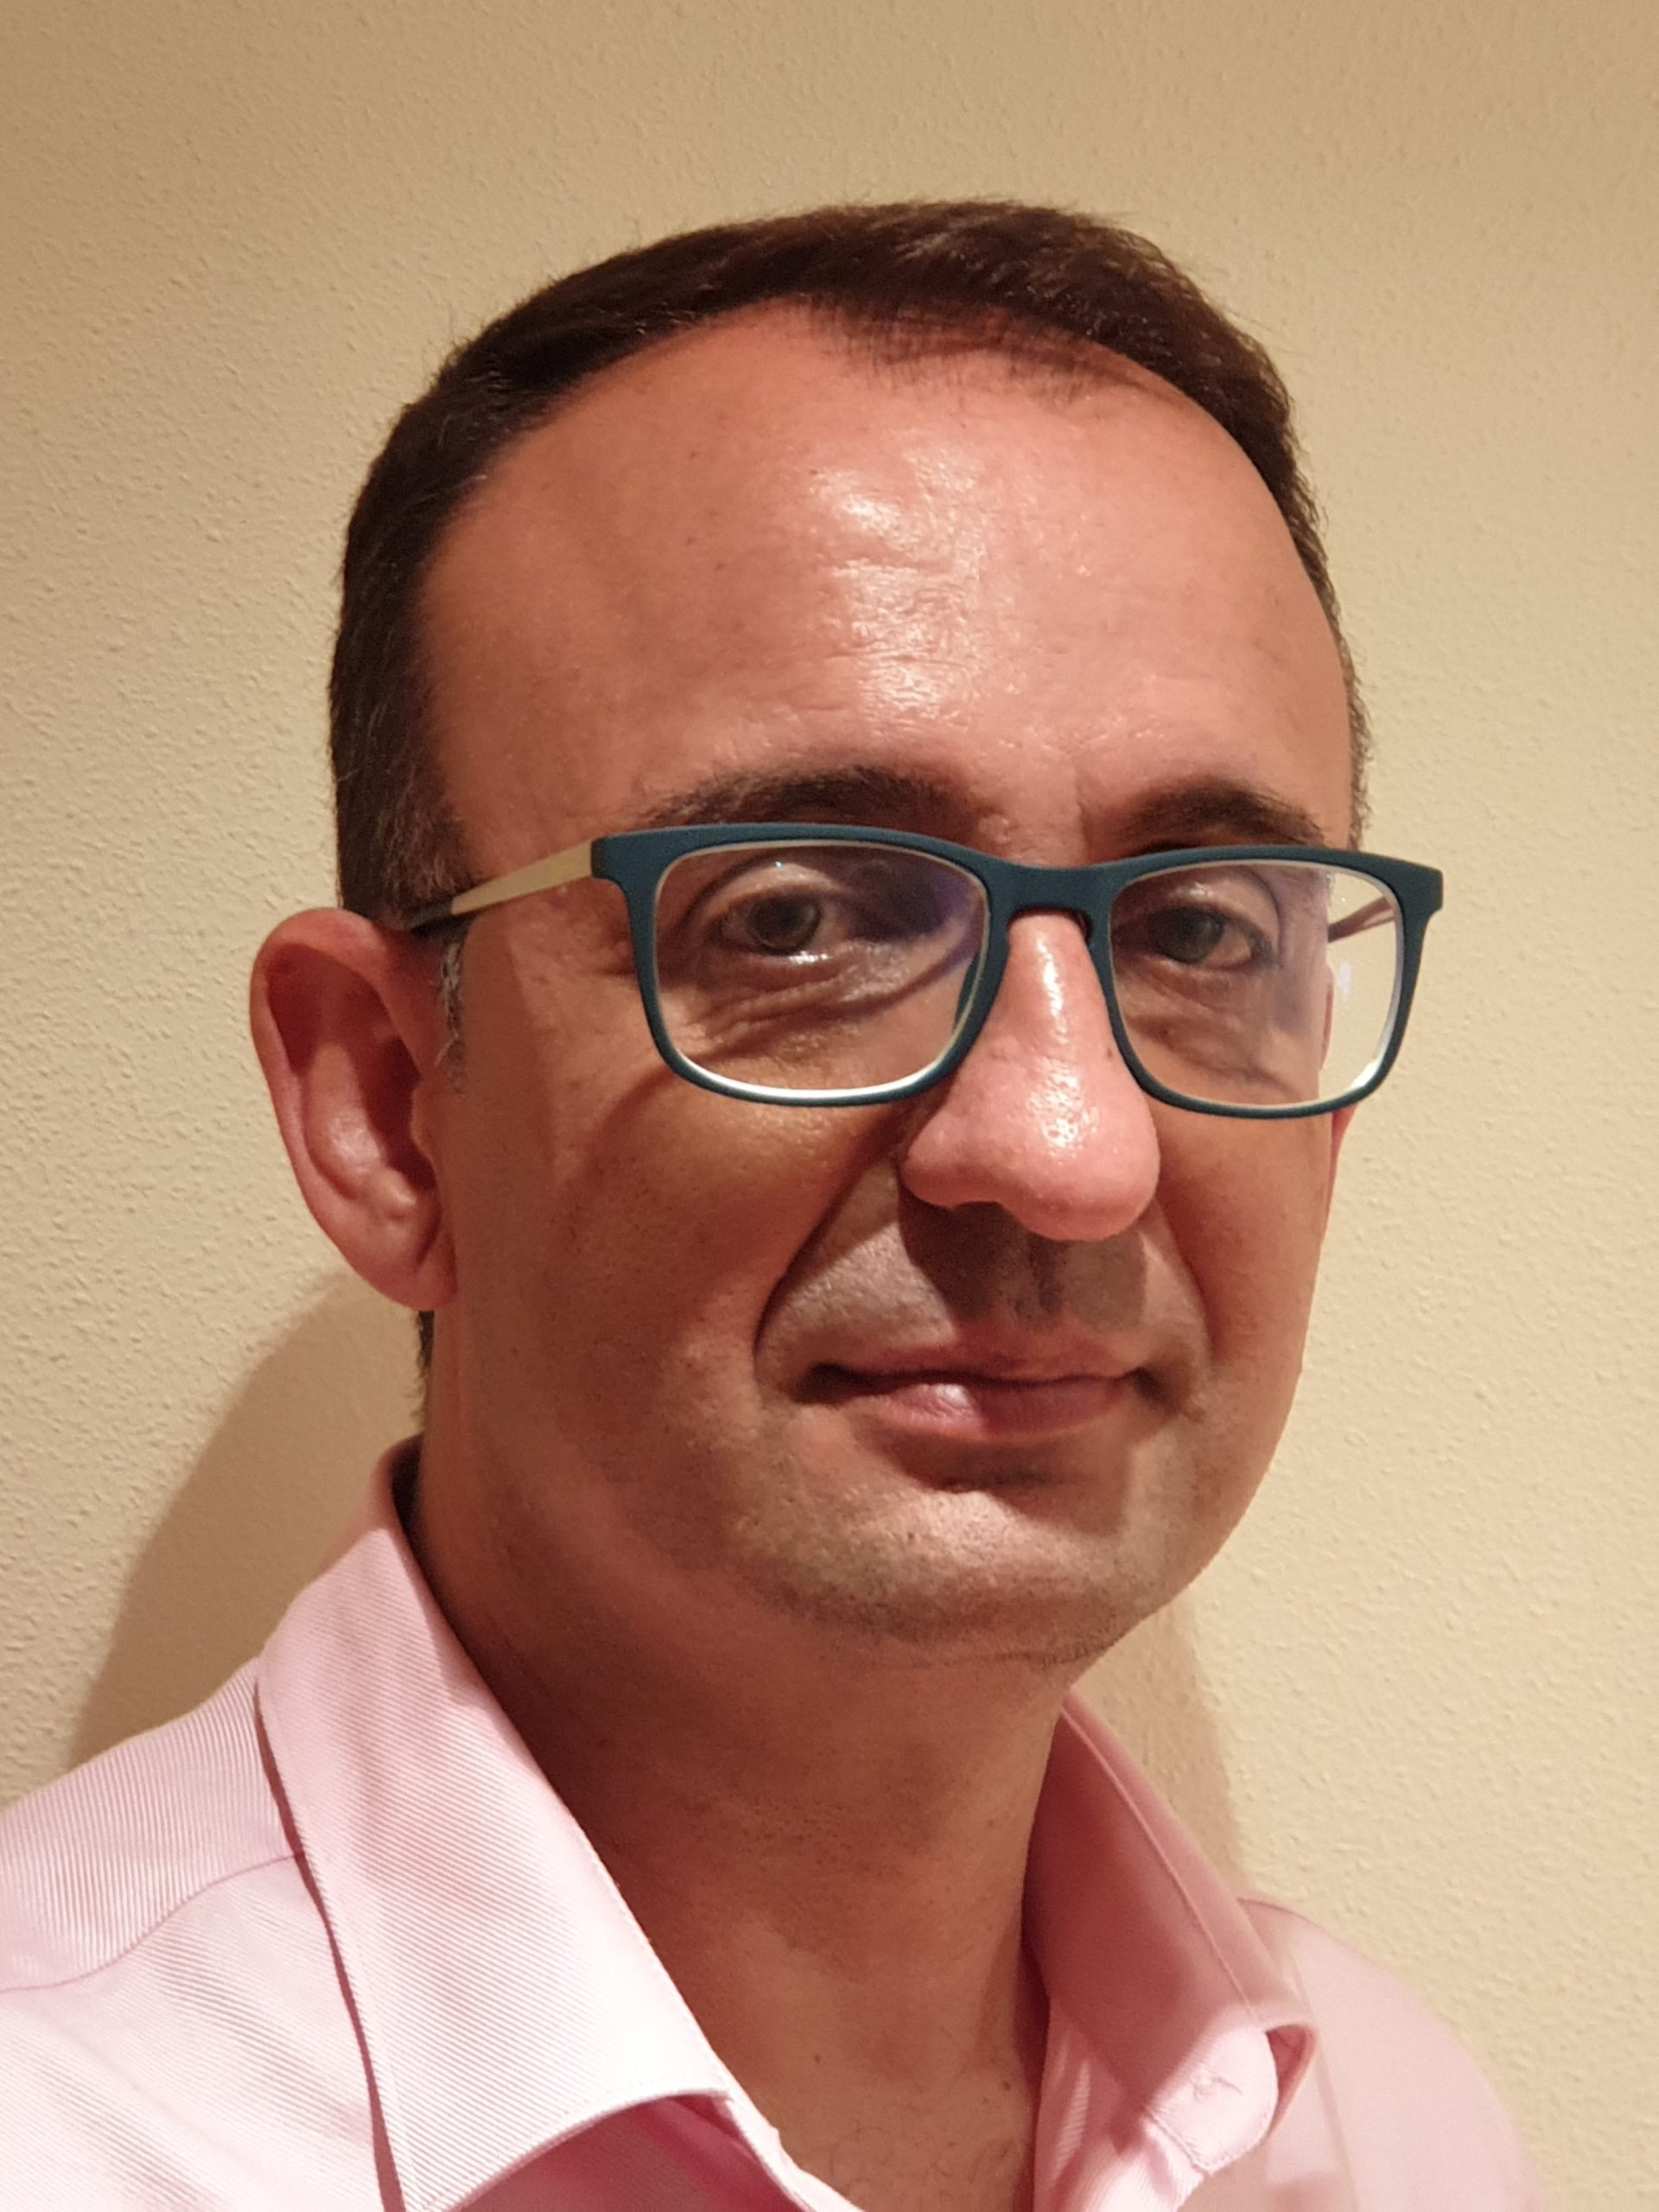 Espresso Tutorials: Inigo Montoya